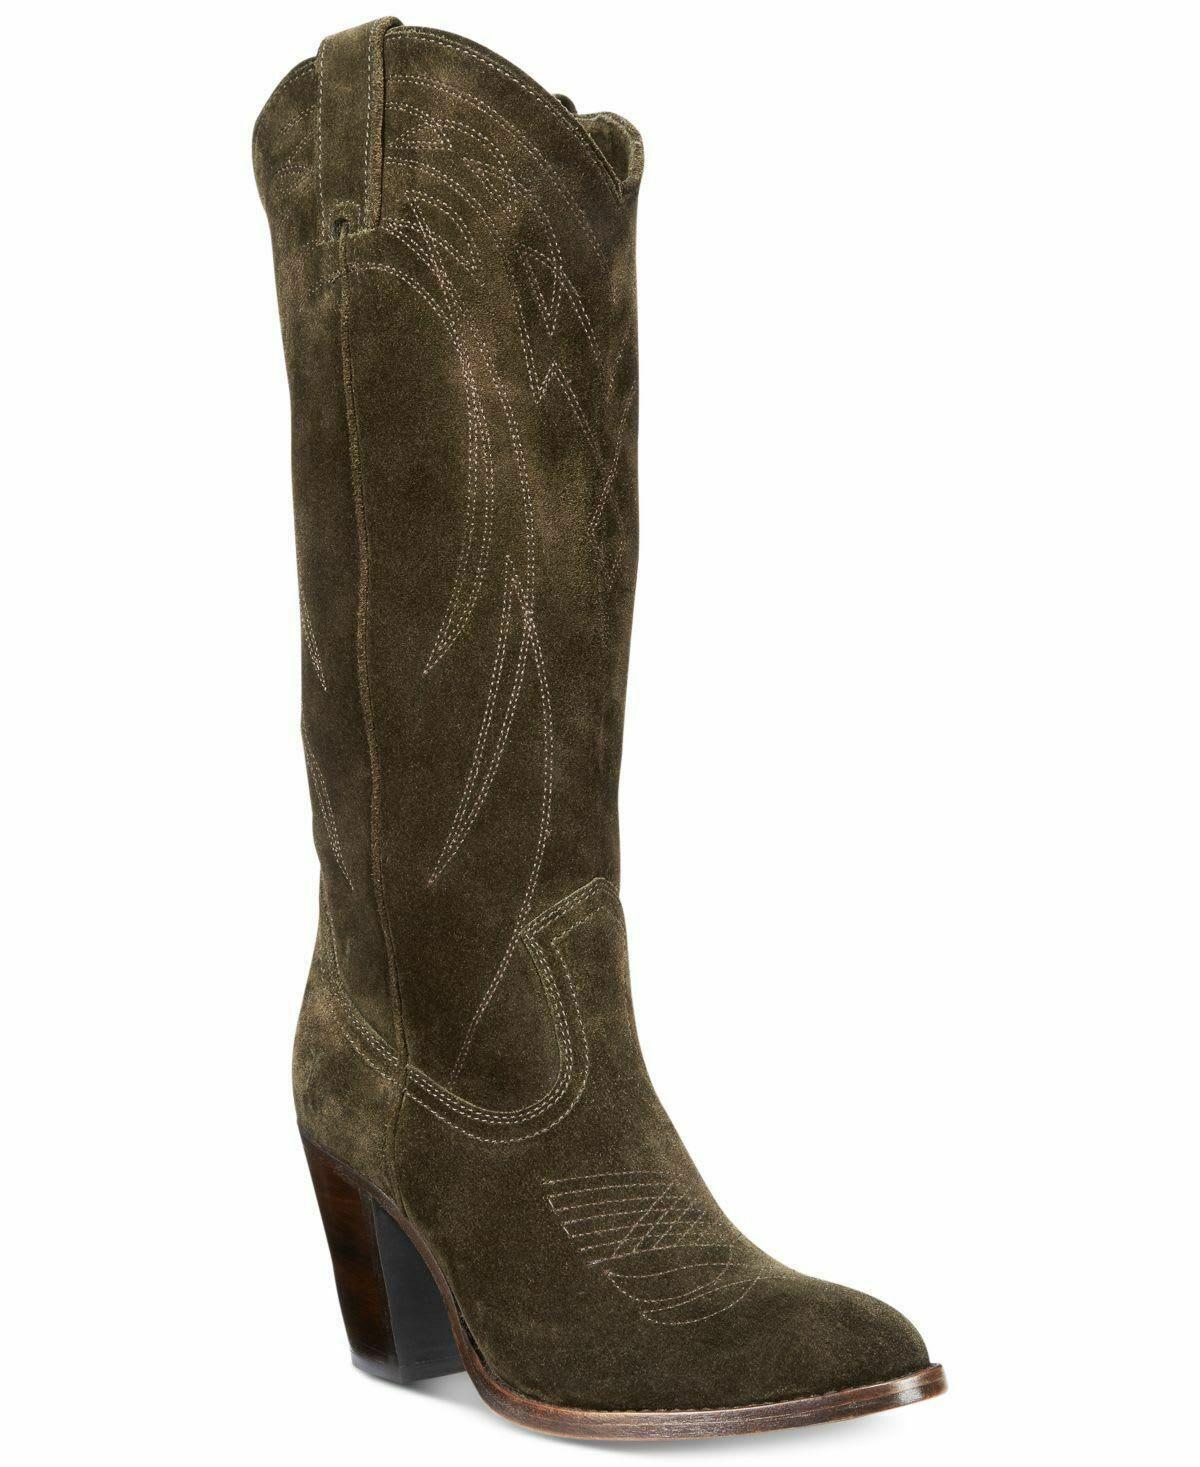 Frye Women's Women's Women's Ilana Pull On Cowboy Boots Size 8.5M Fatigue, MSRP  368 0b5ebe